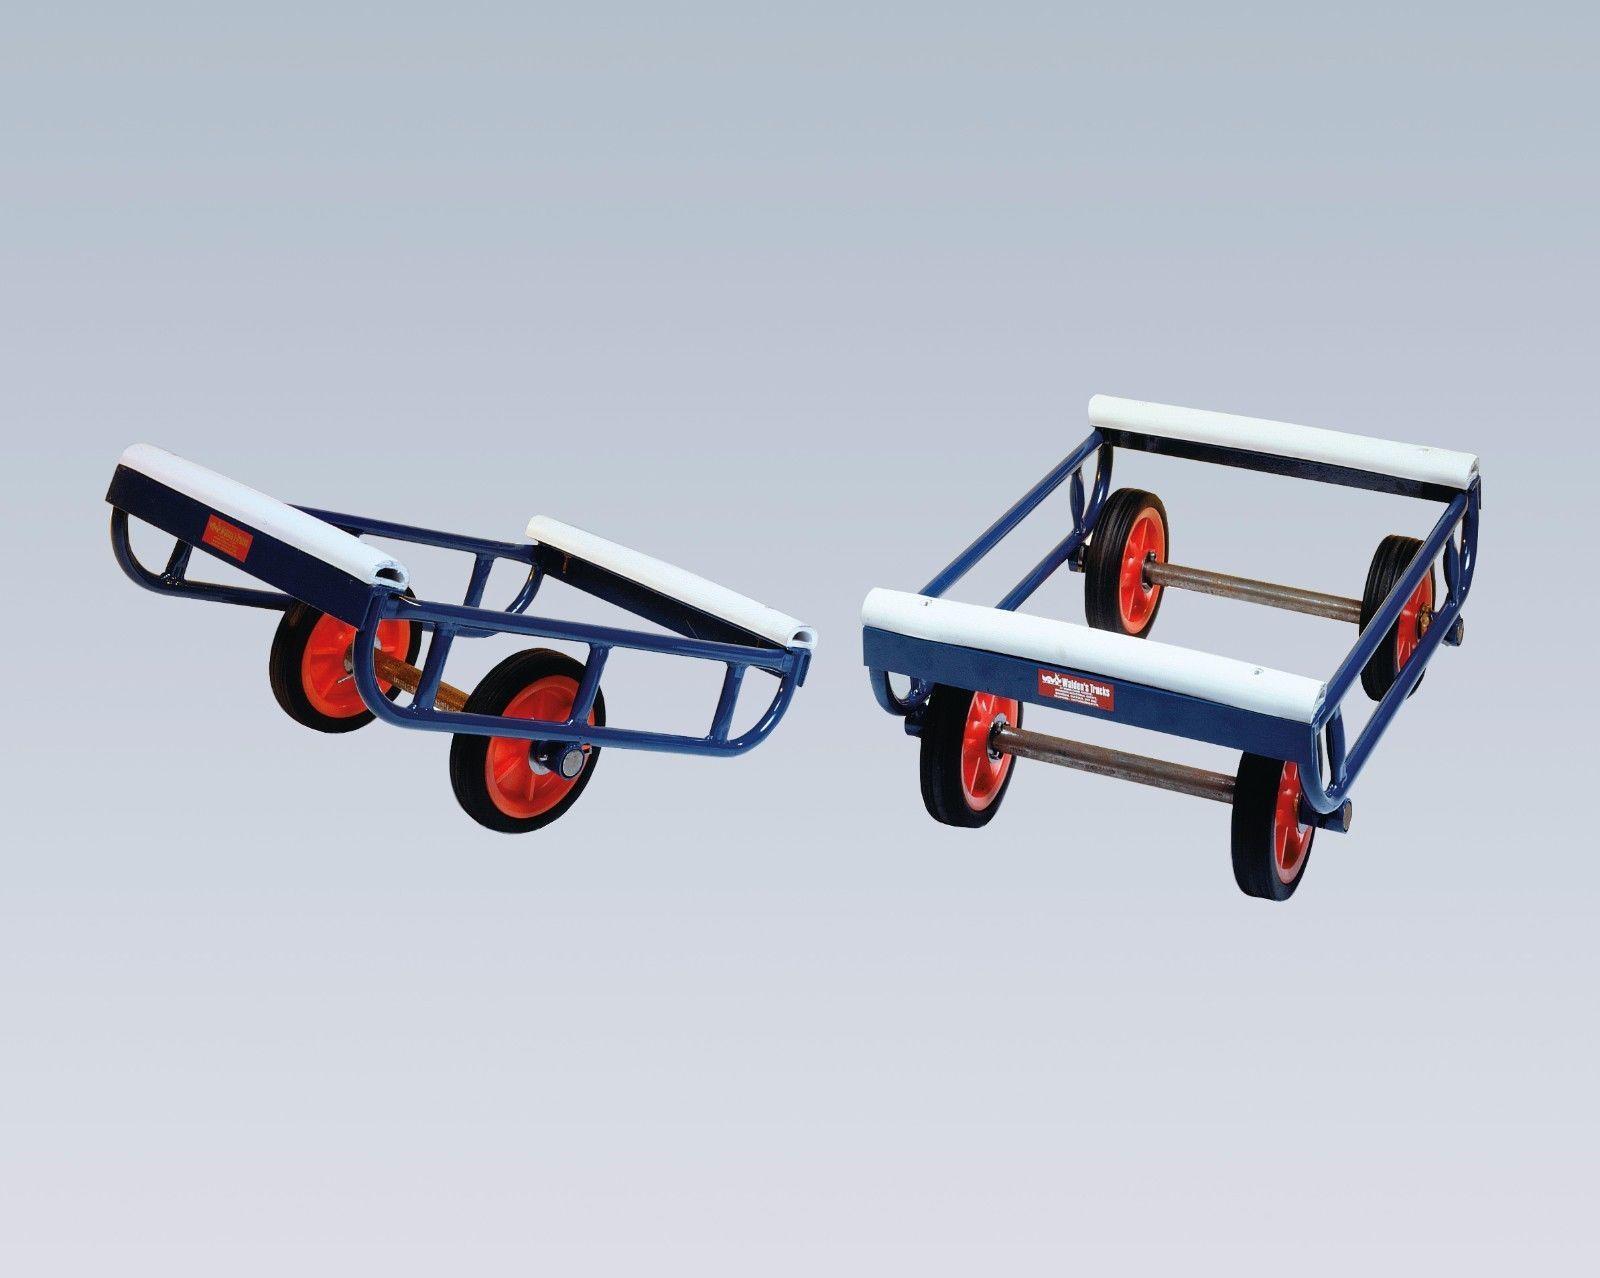 Skate Trolleys Heavy Duty - Crates, Machines, Pallets - Heavy Load Skate Dollie